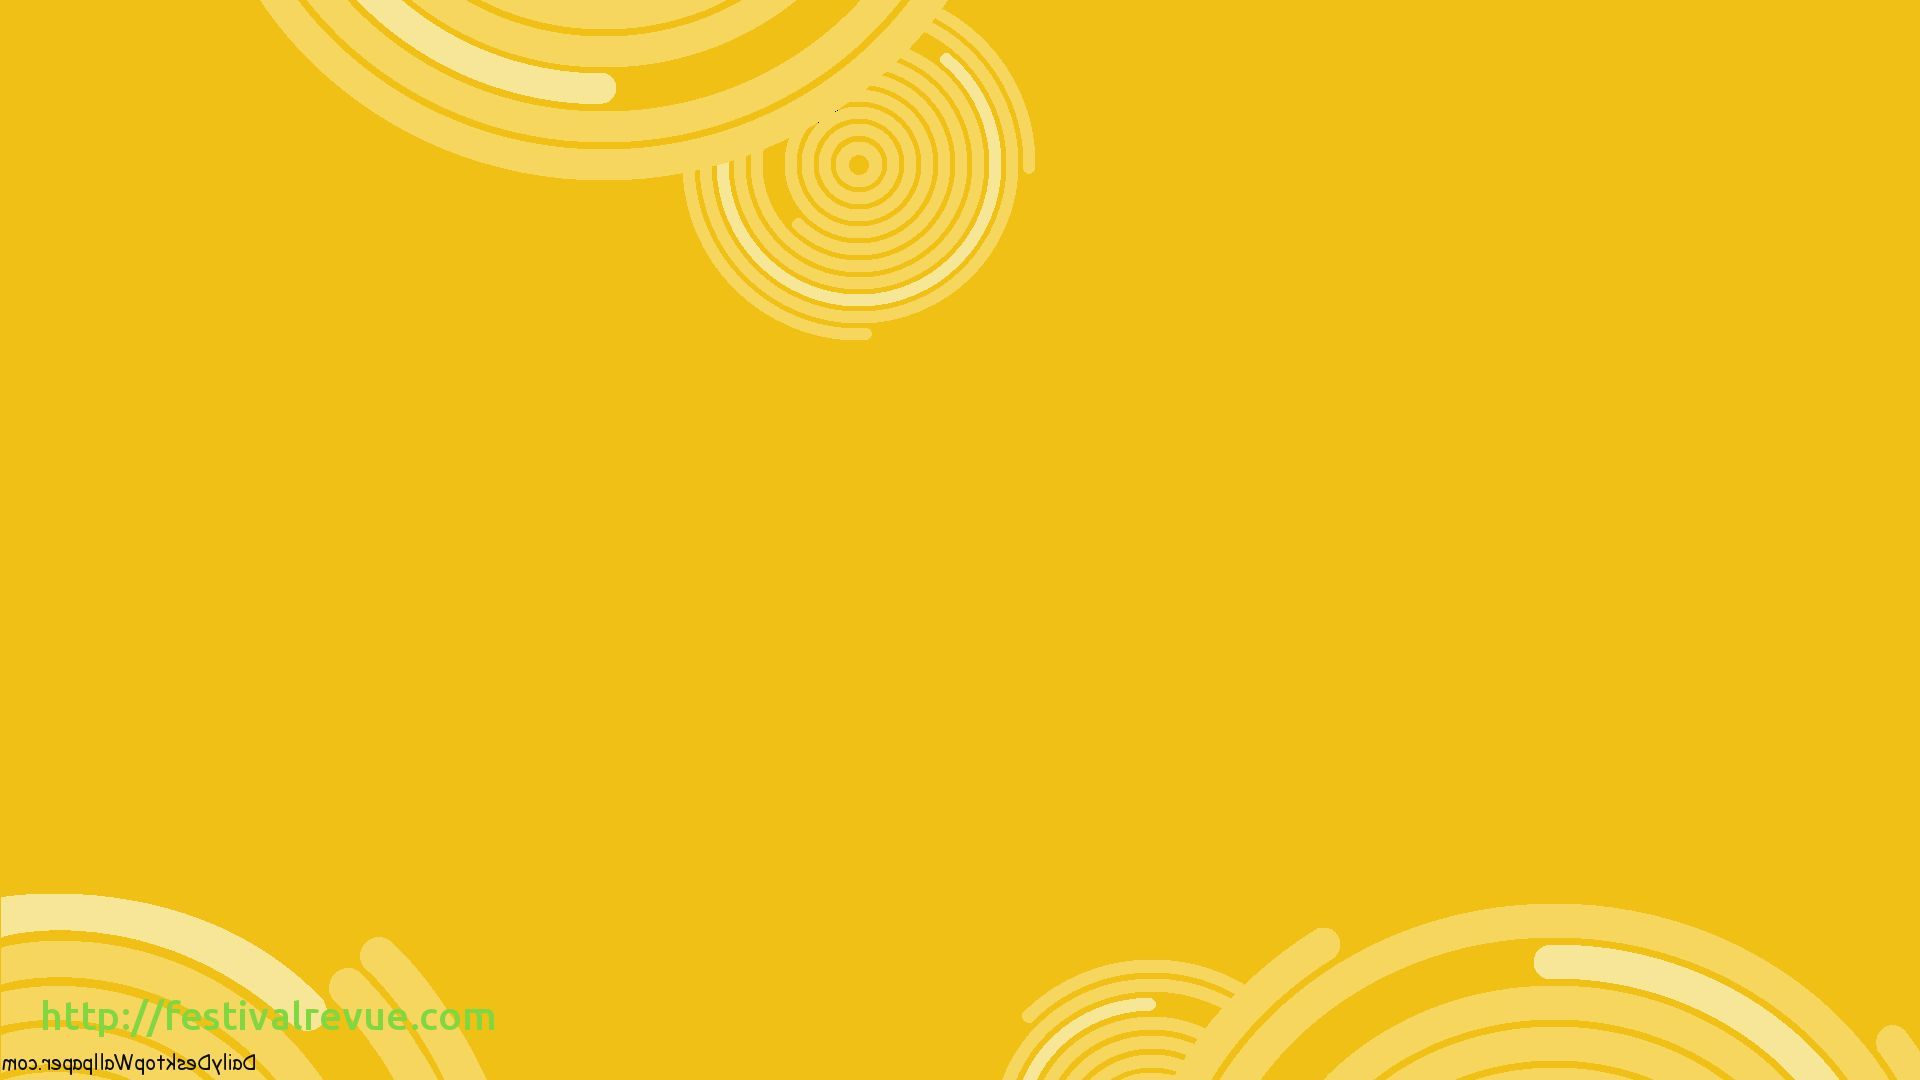 Wallpaper Yellow Theme Desktop Best Wallpaper Hd Yellow Wallpaper Yellow Theme Wallpaper